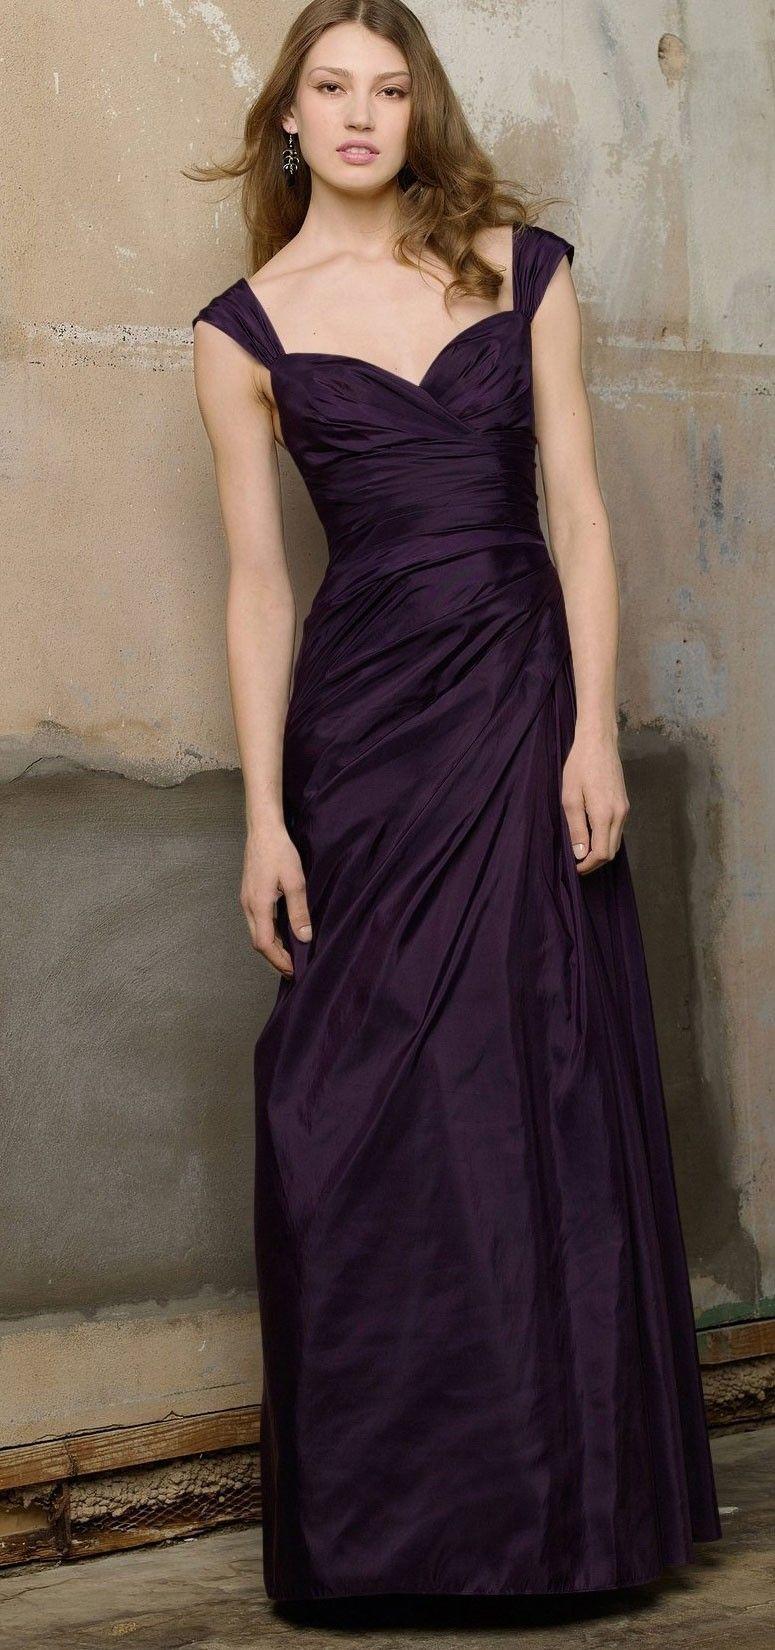 Style 172 - Bridesmaid Dresses at Weddington Way ~ Bridesmaid Dress ...